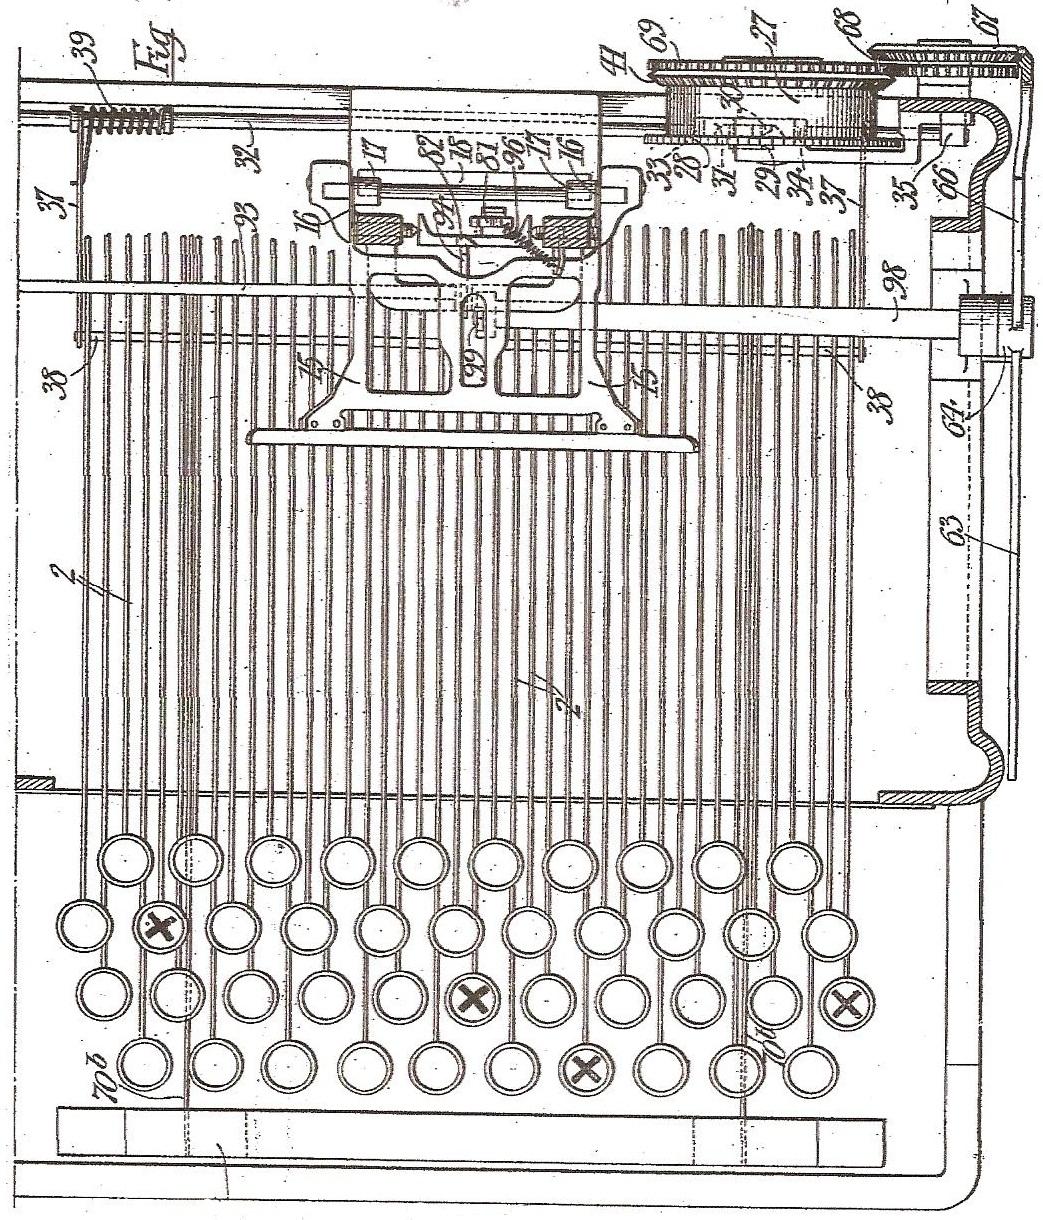 Oz Typewriter On This Day In Typewriter Historyviii